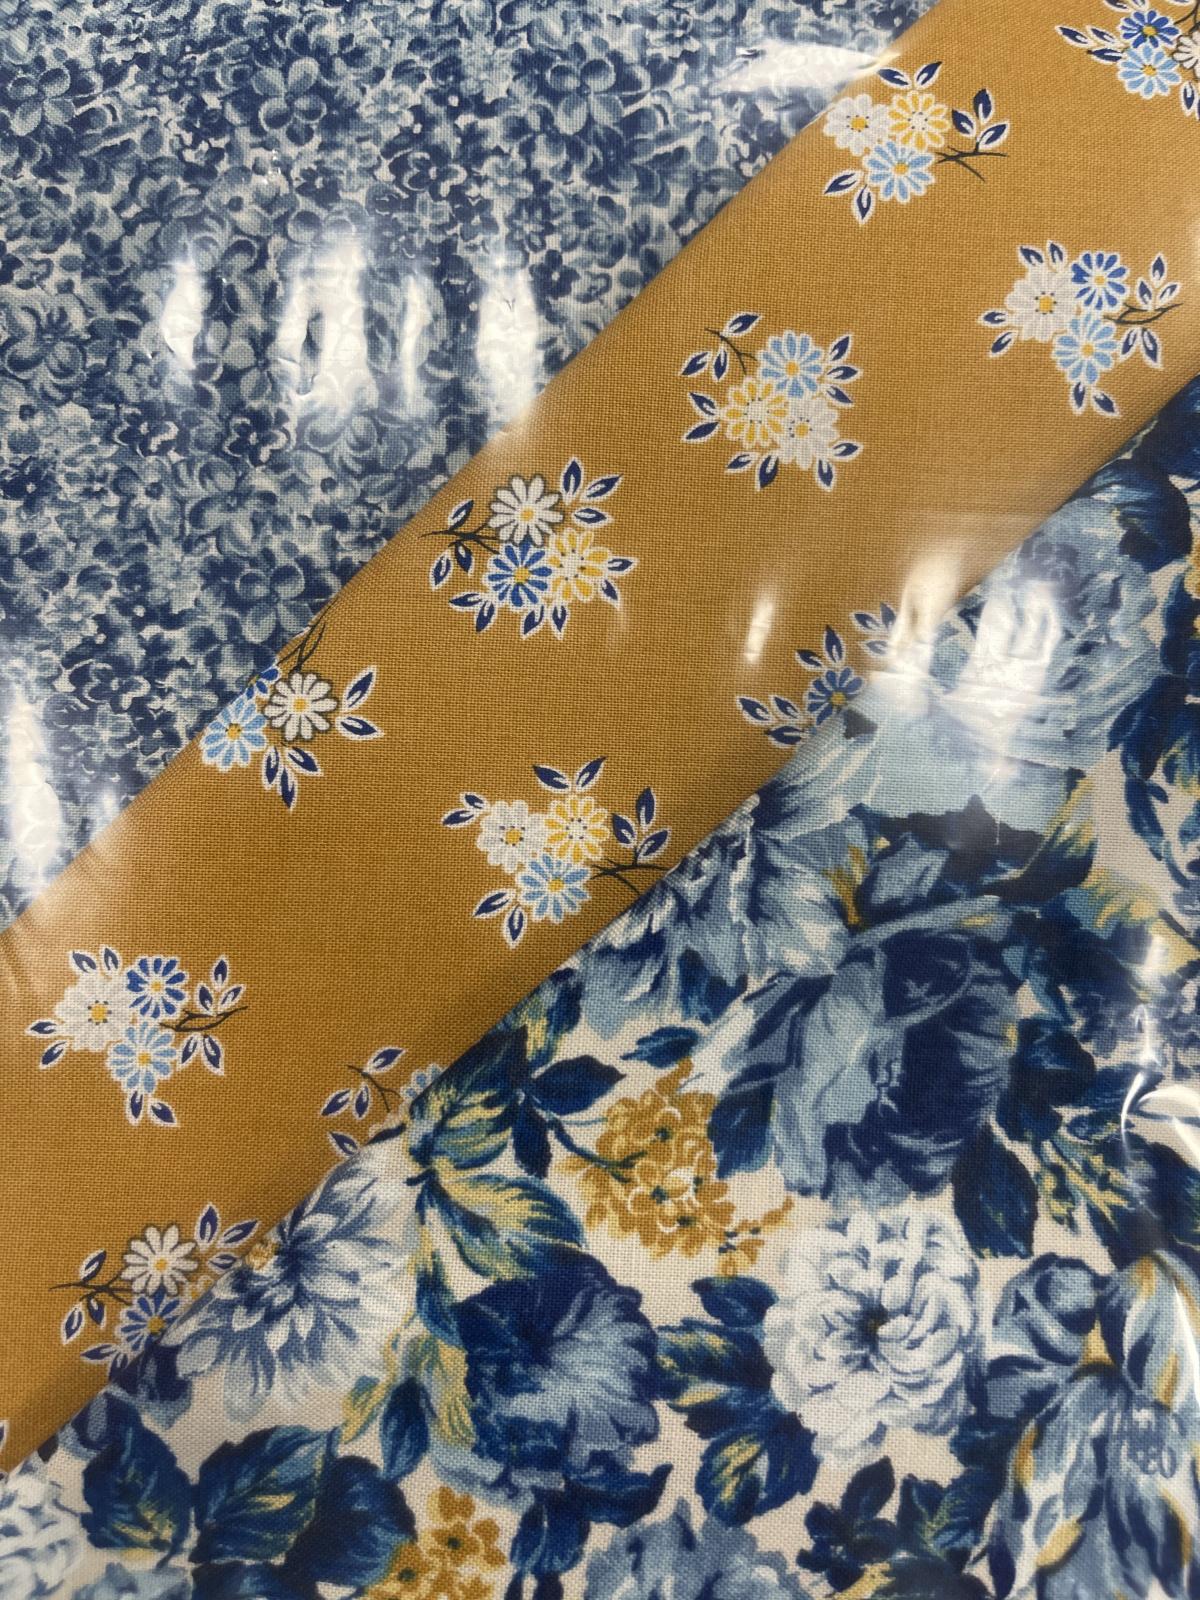 Liberty Emporium 3 yard kit Blue Florals and Gold